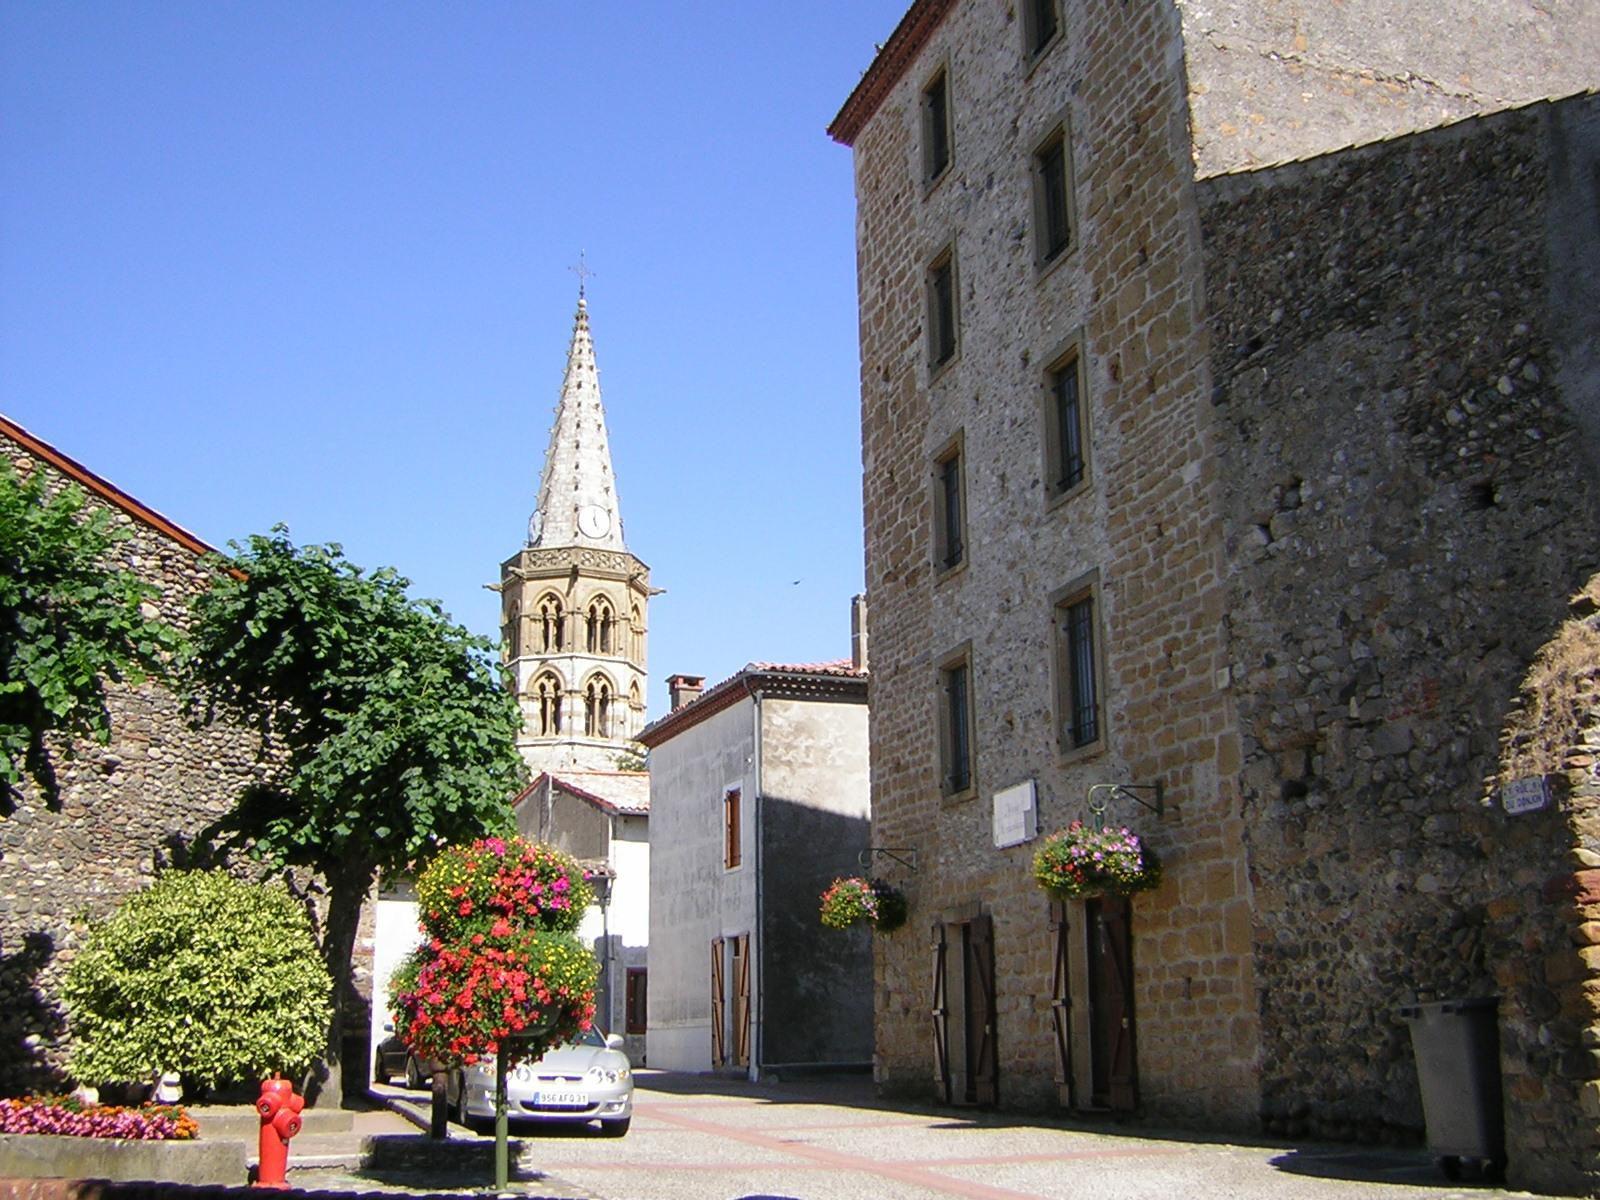 Image : Martres-Tolosane